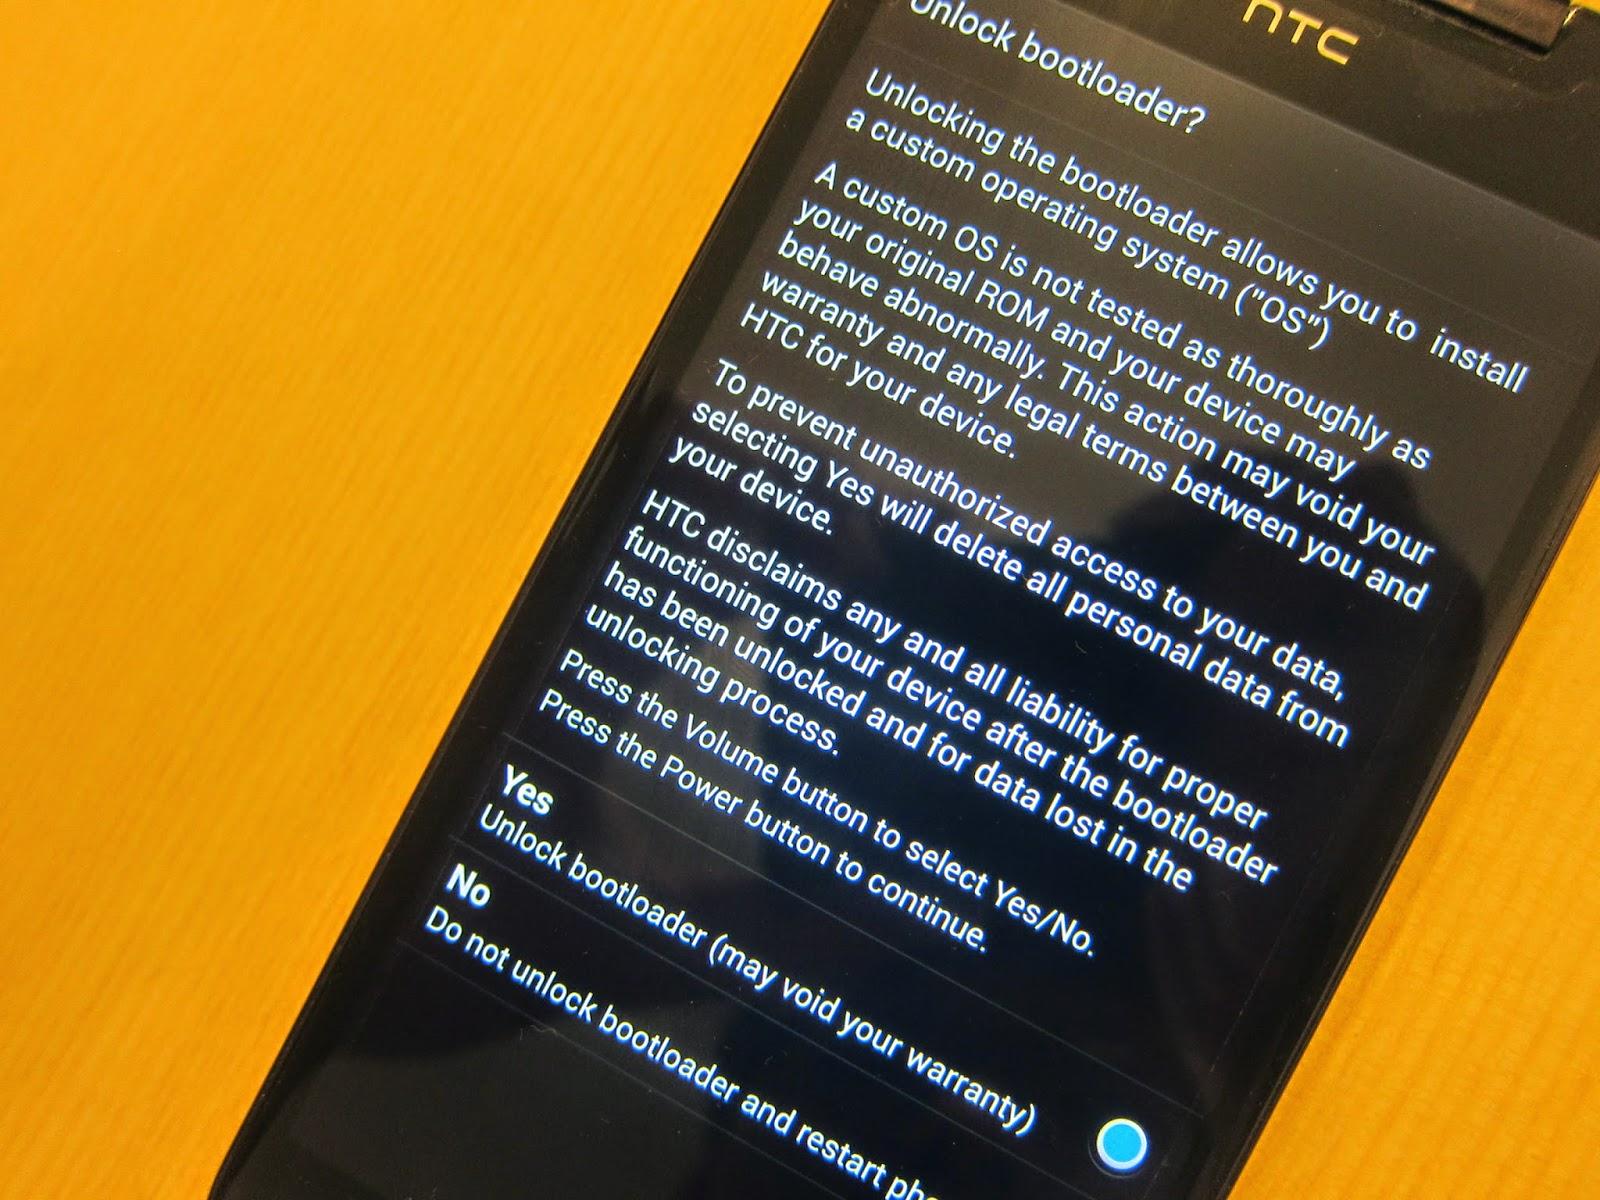 IMG 2324 - 【圖文教學】HTC Butterfly 4.3/4.4 解鎖+ROOT